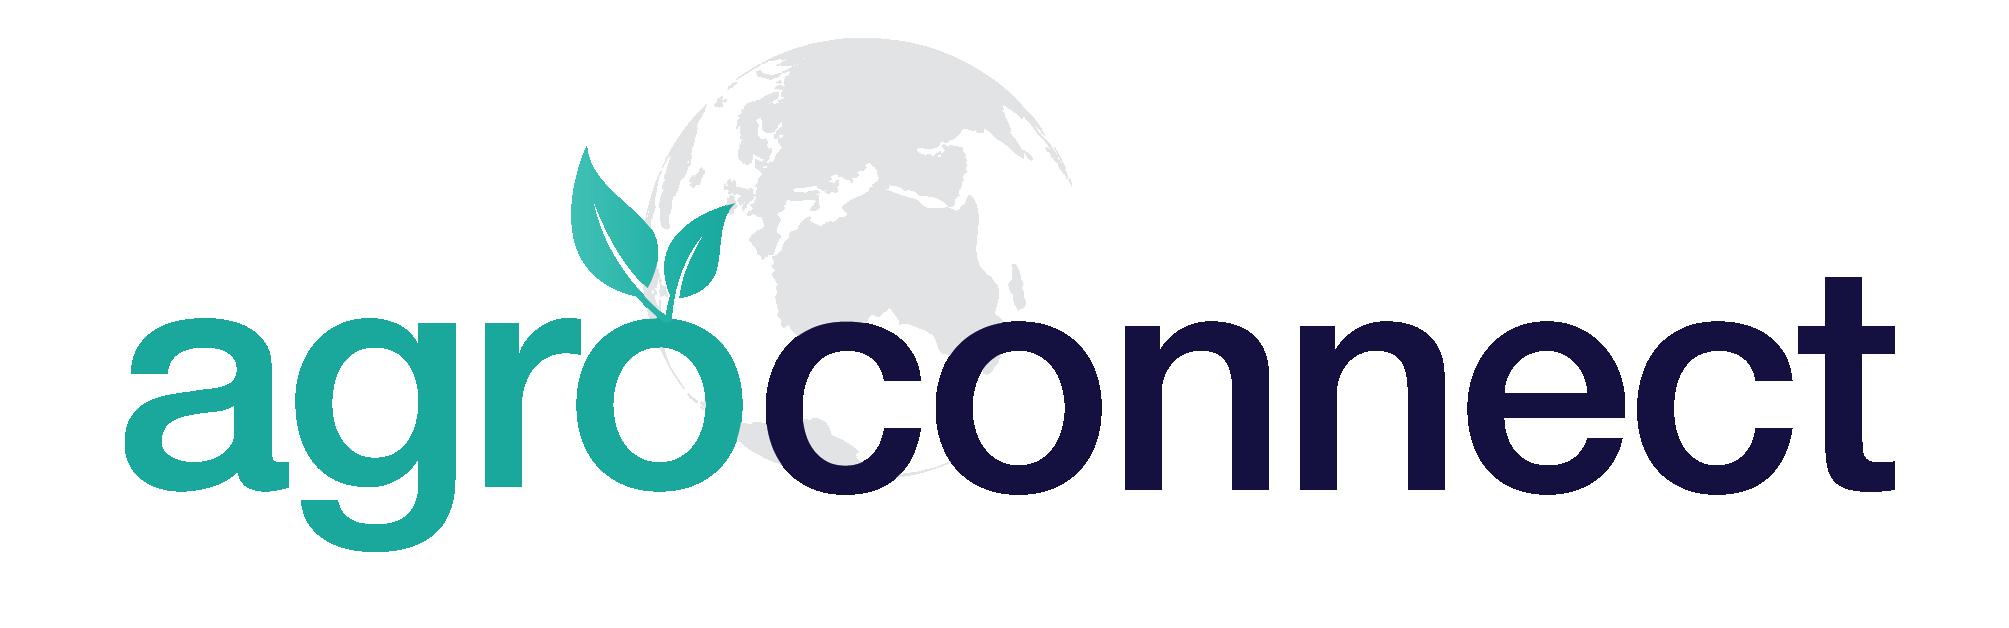 agroconnect logo